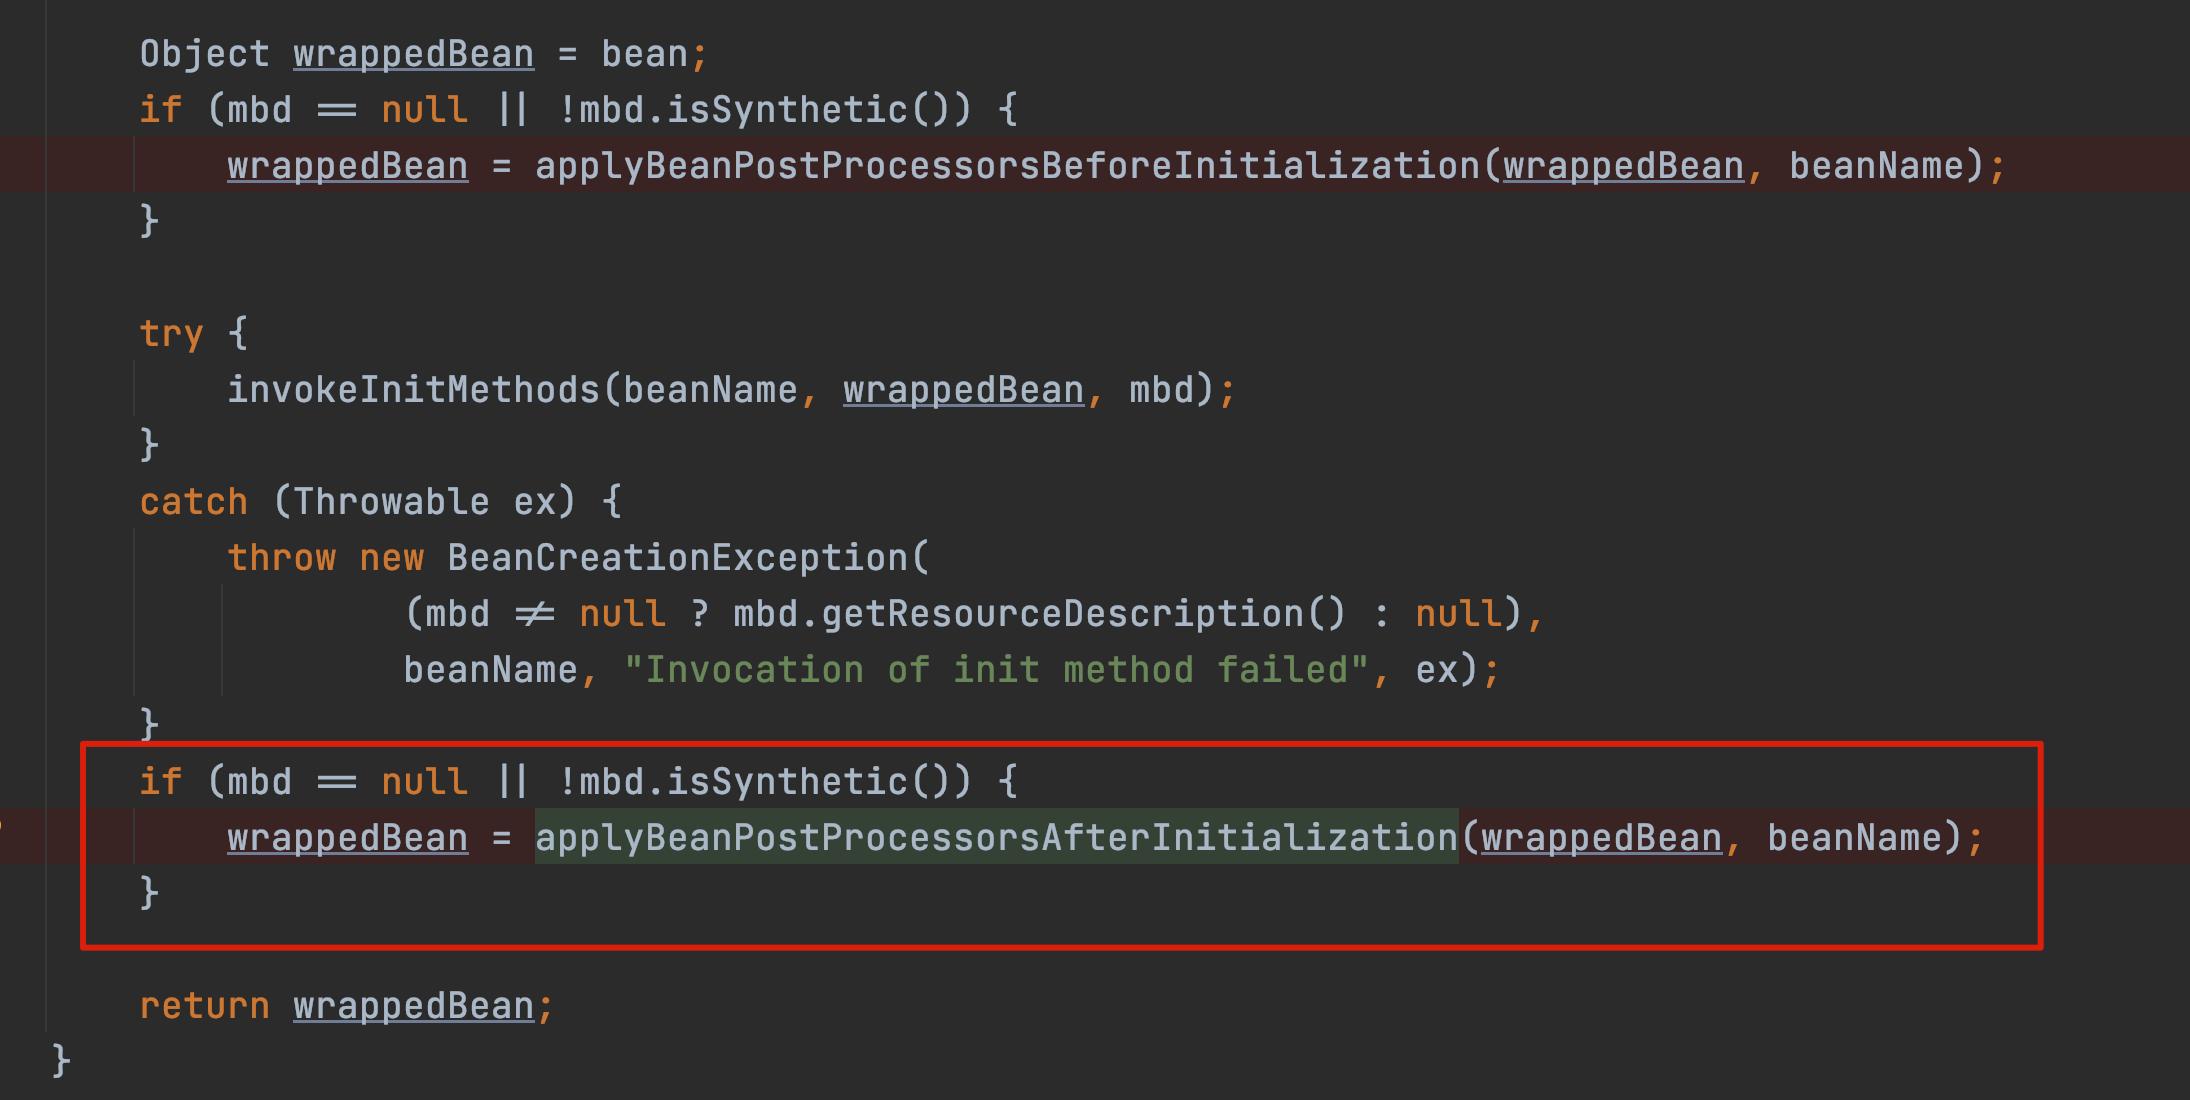 applyBeanPostProcessorsAfterInitialization